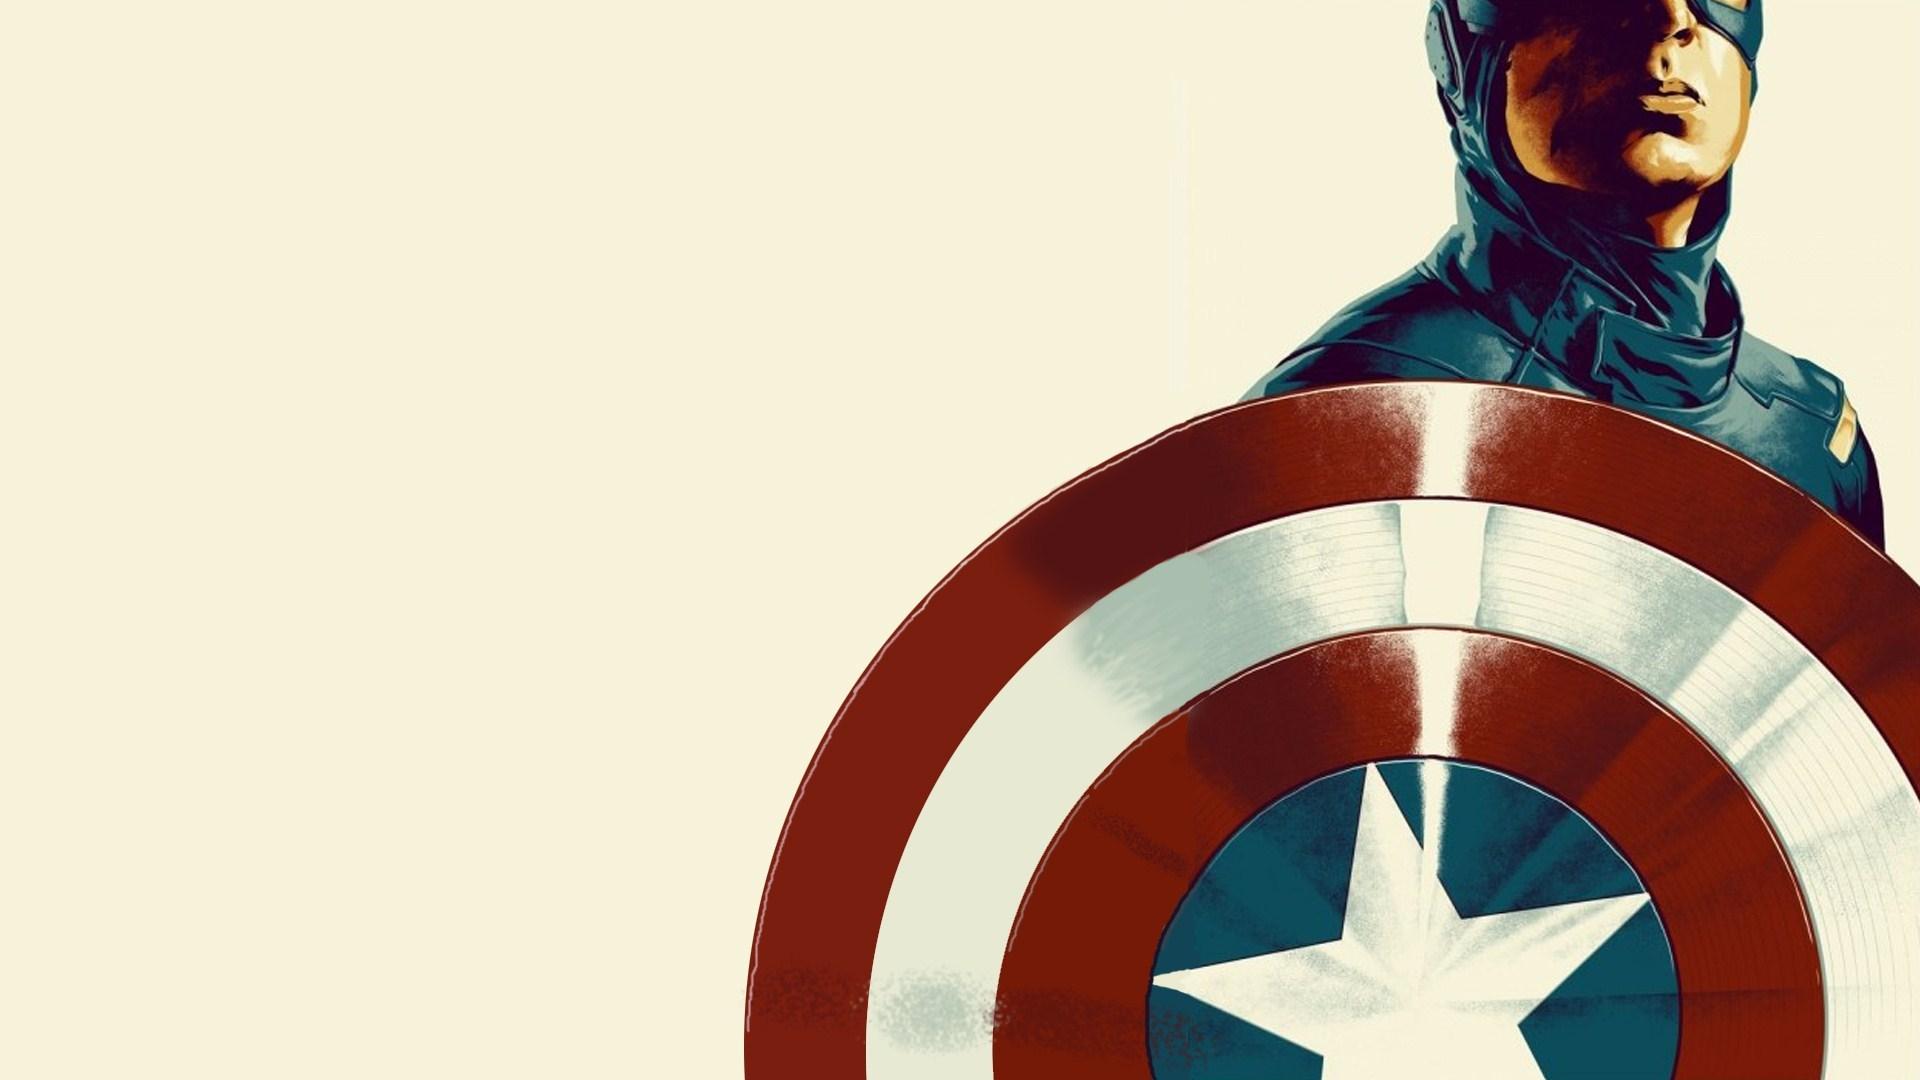 Captain America Shield Poster Art Hd Wallpaper Wallpaper List 1920x1080